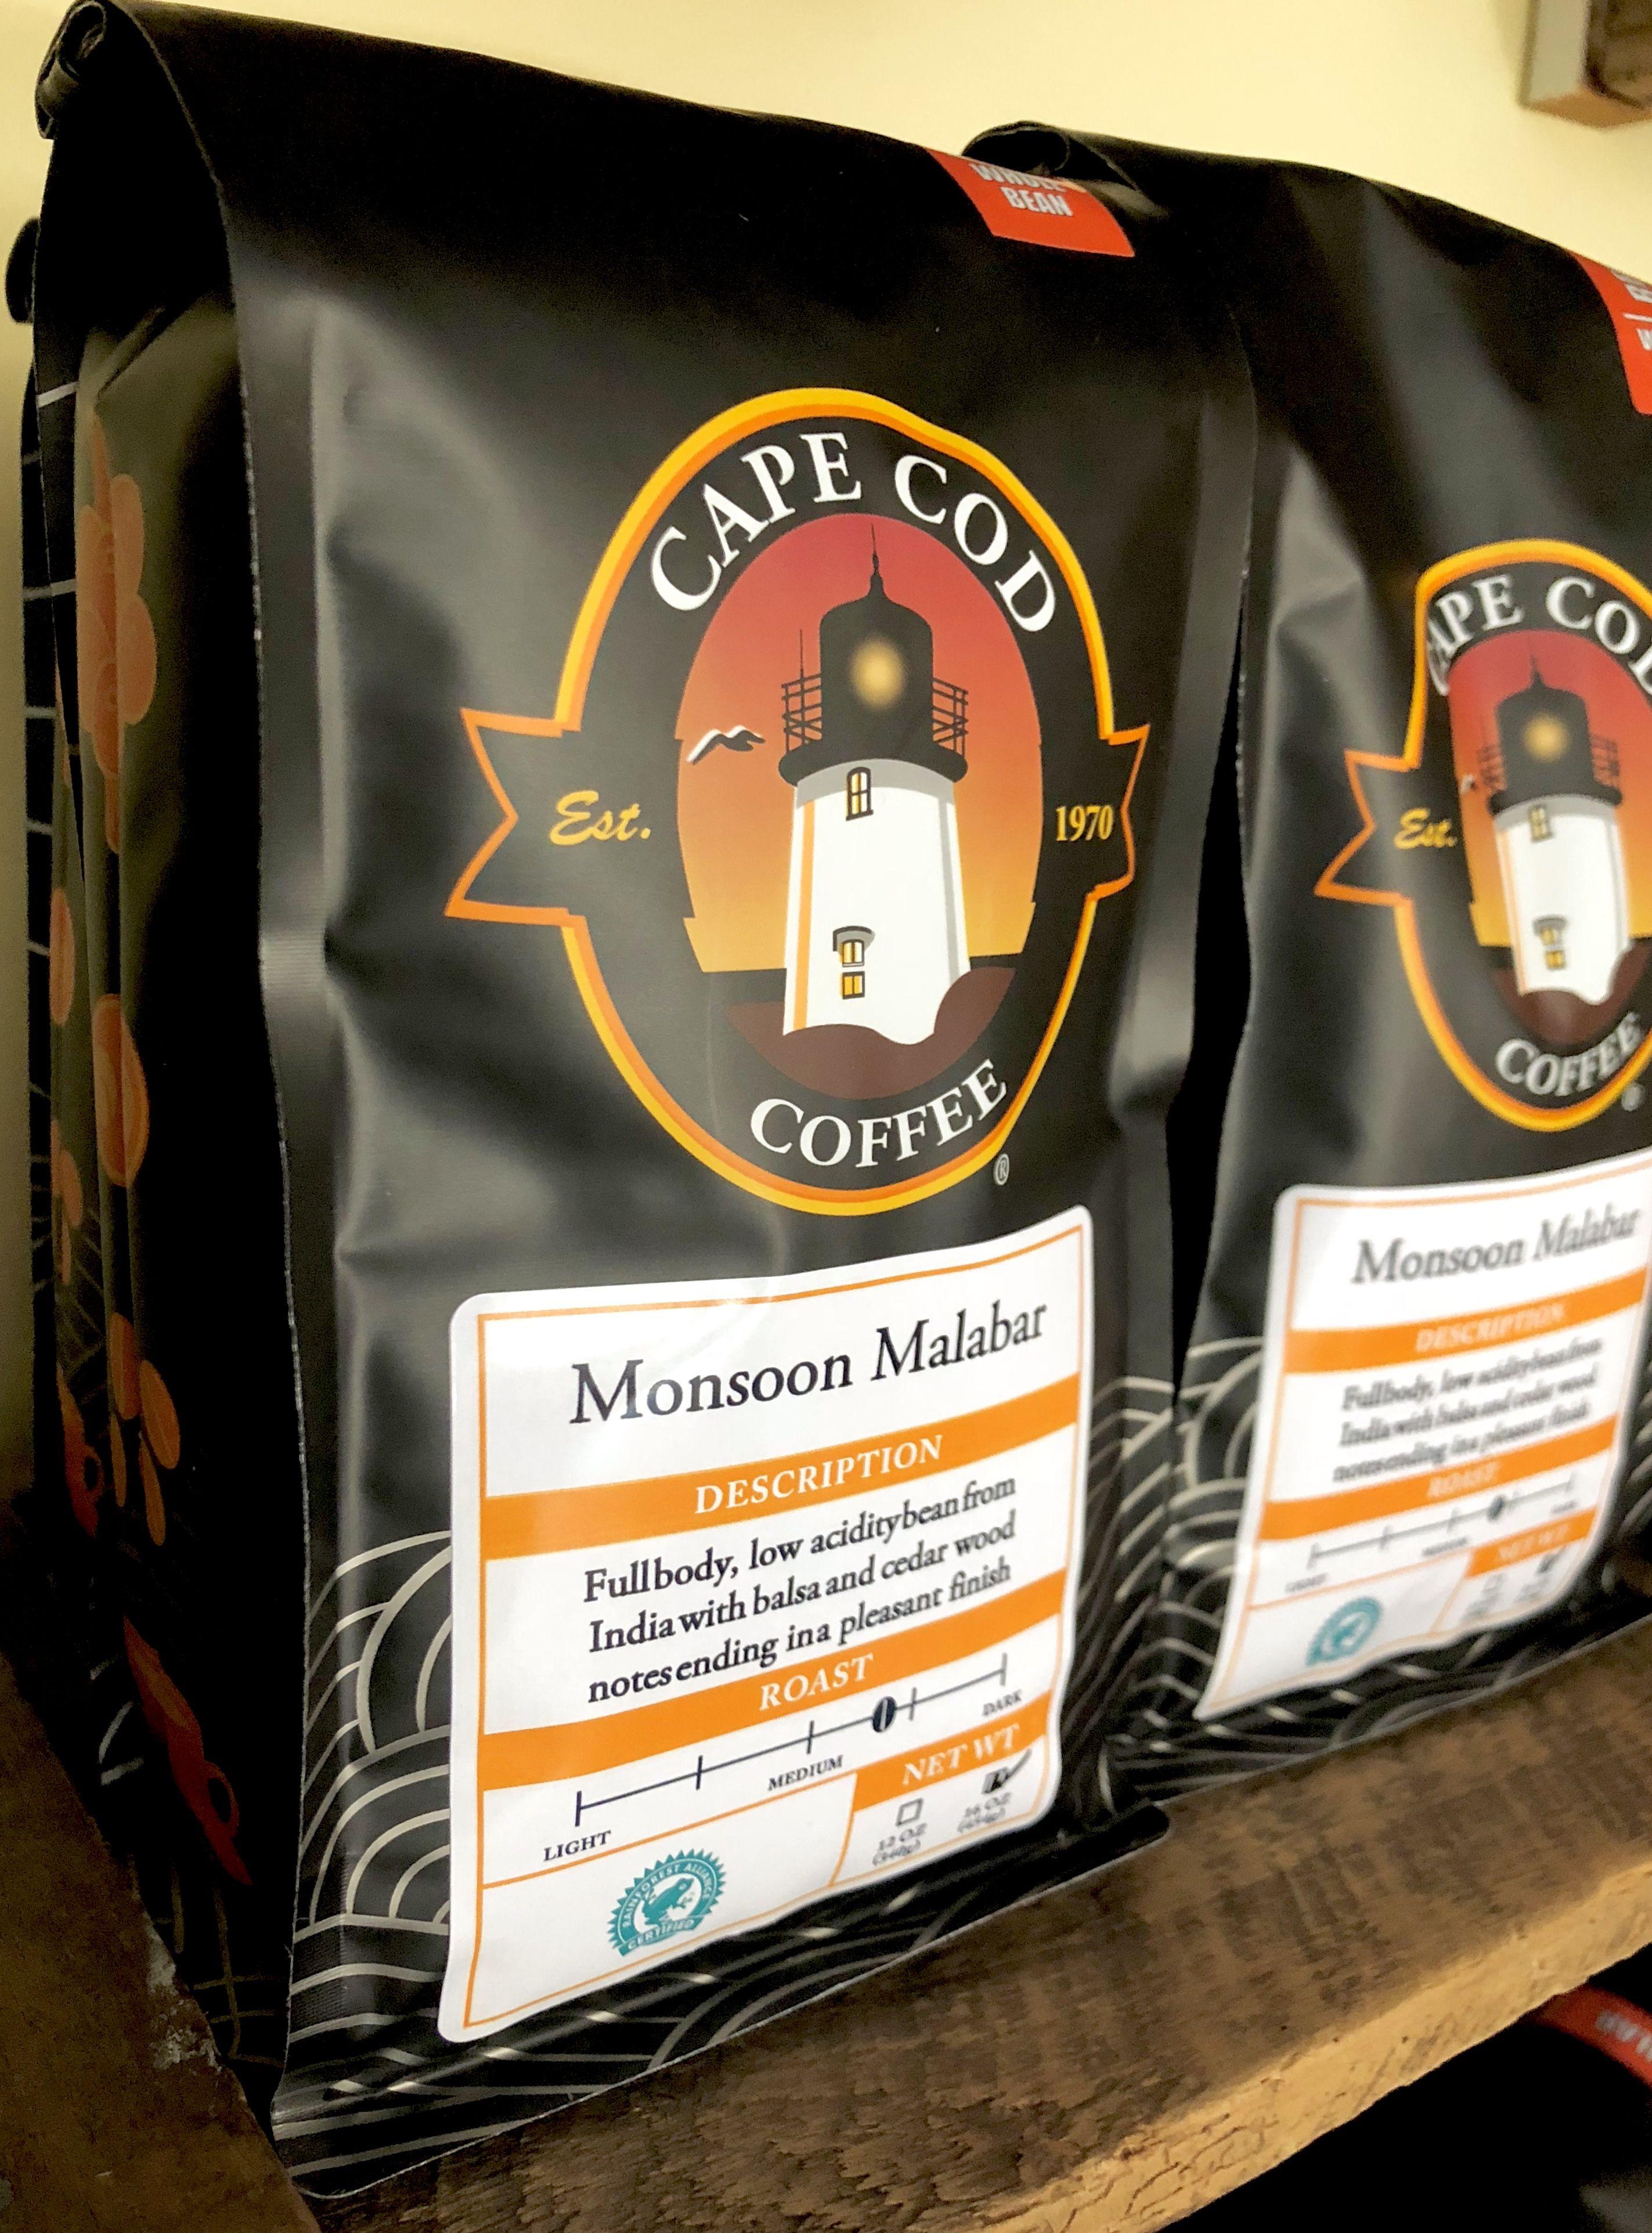 Monsoon Malabar Green coffee diet, Green coffee extract